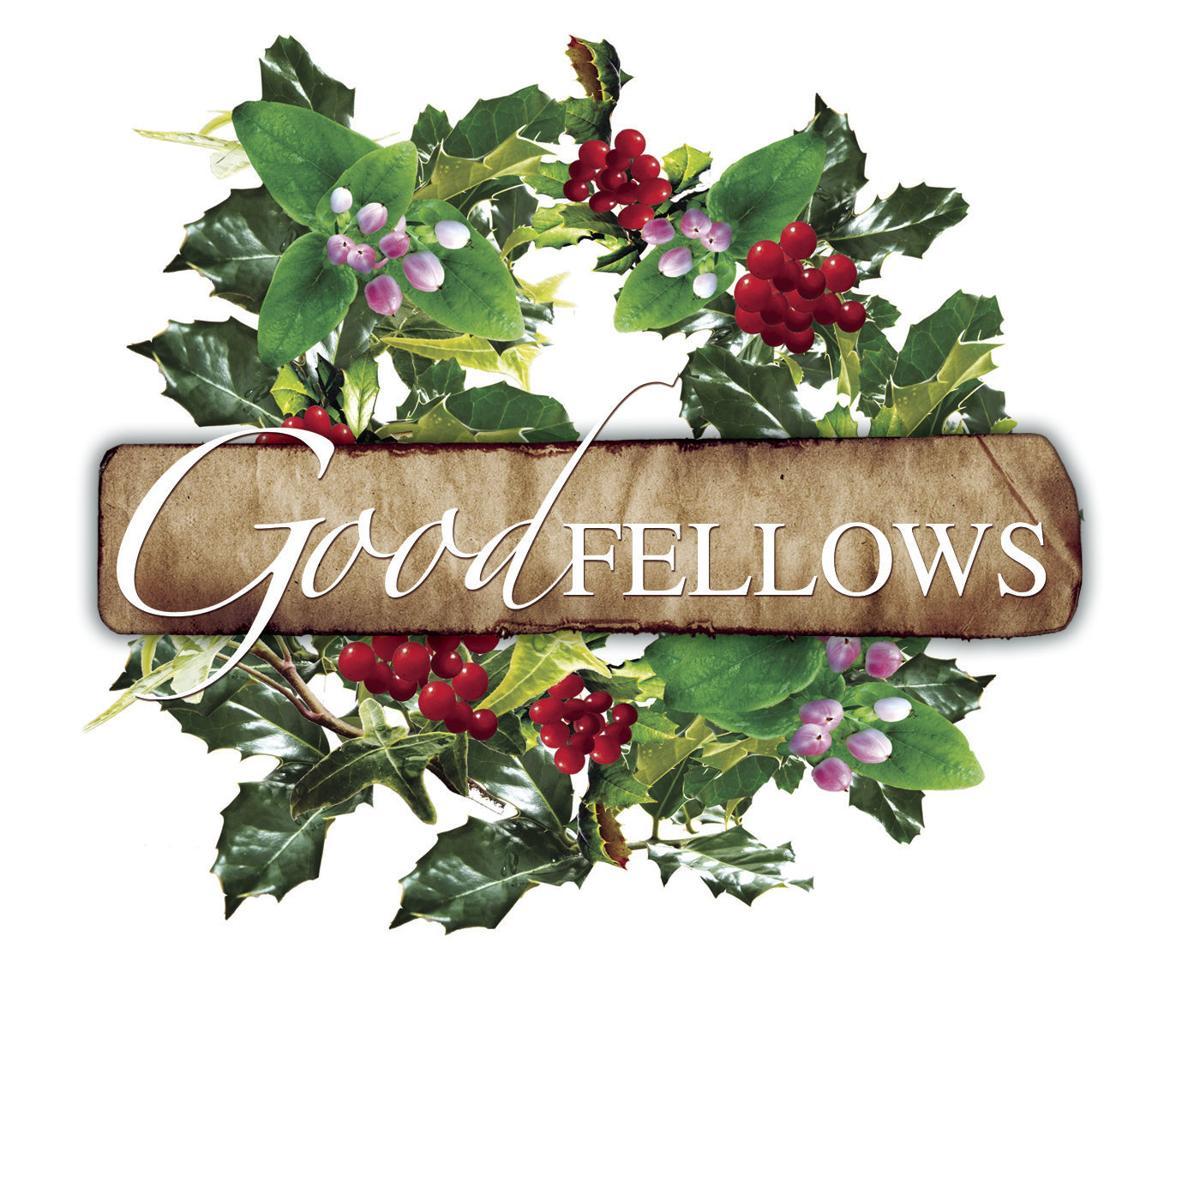 goodfellows graphic wreath.jpg